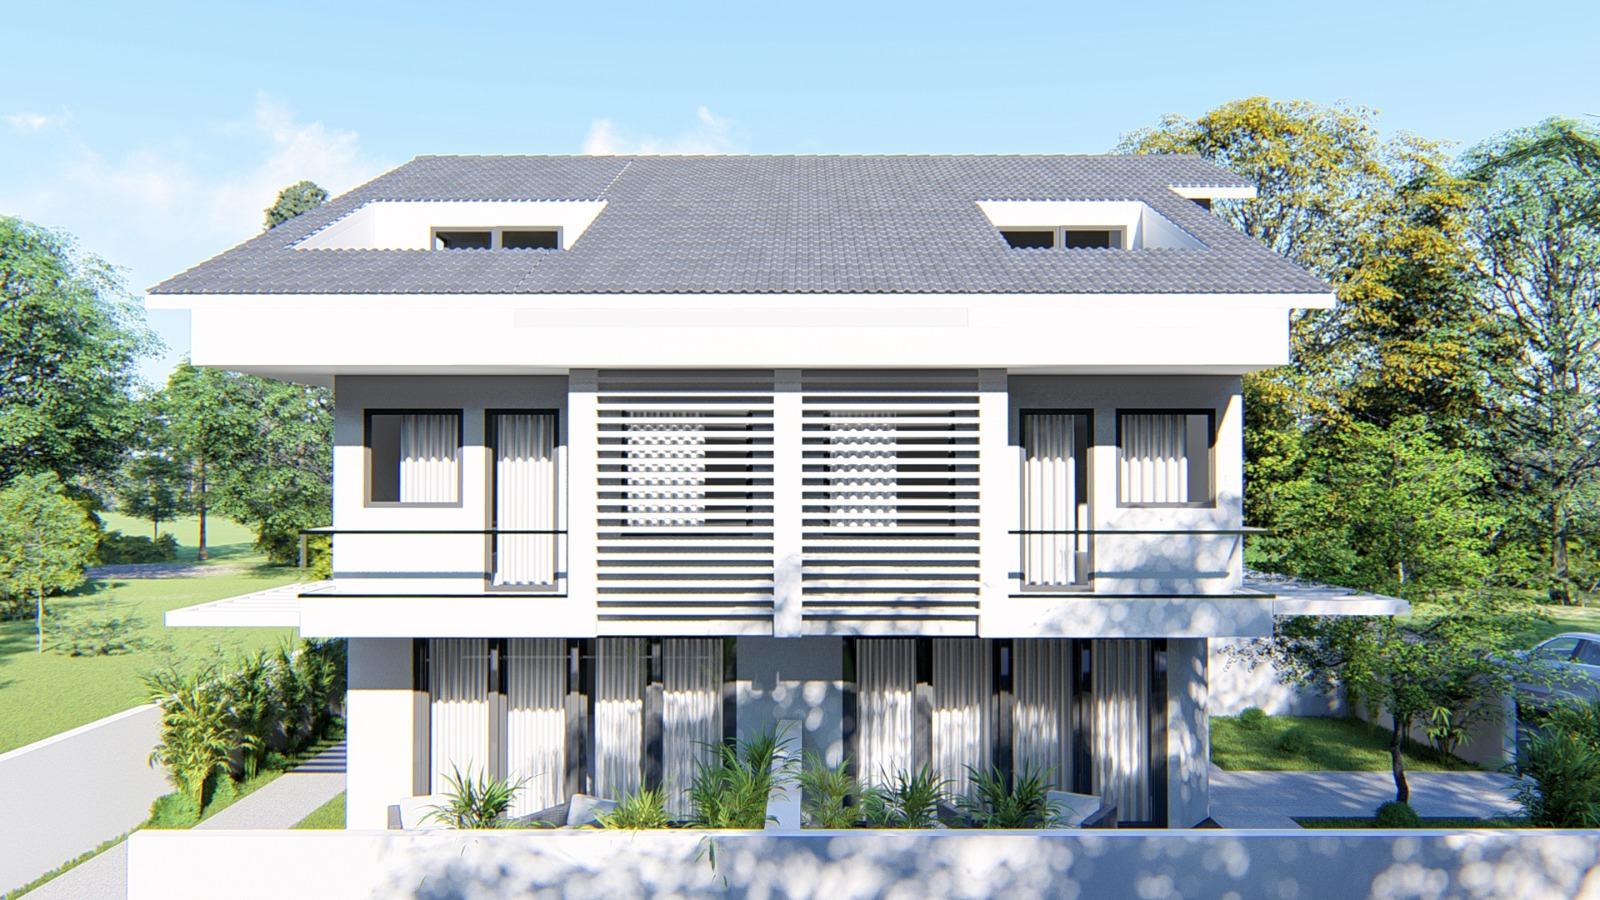 3 Bedroom Triplex Town House Villa for Sale in Fethiye